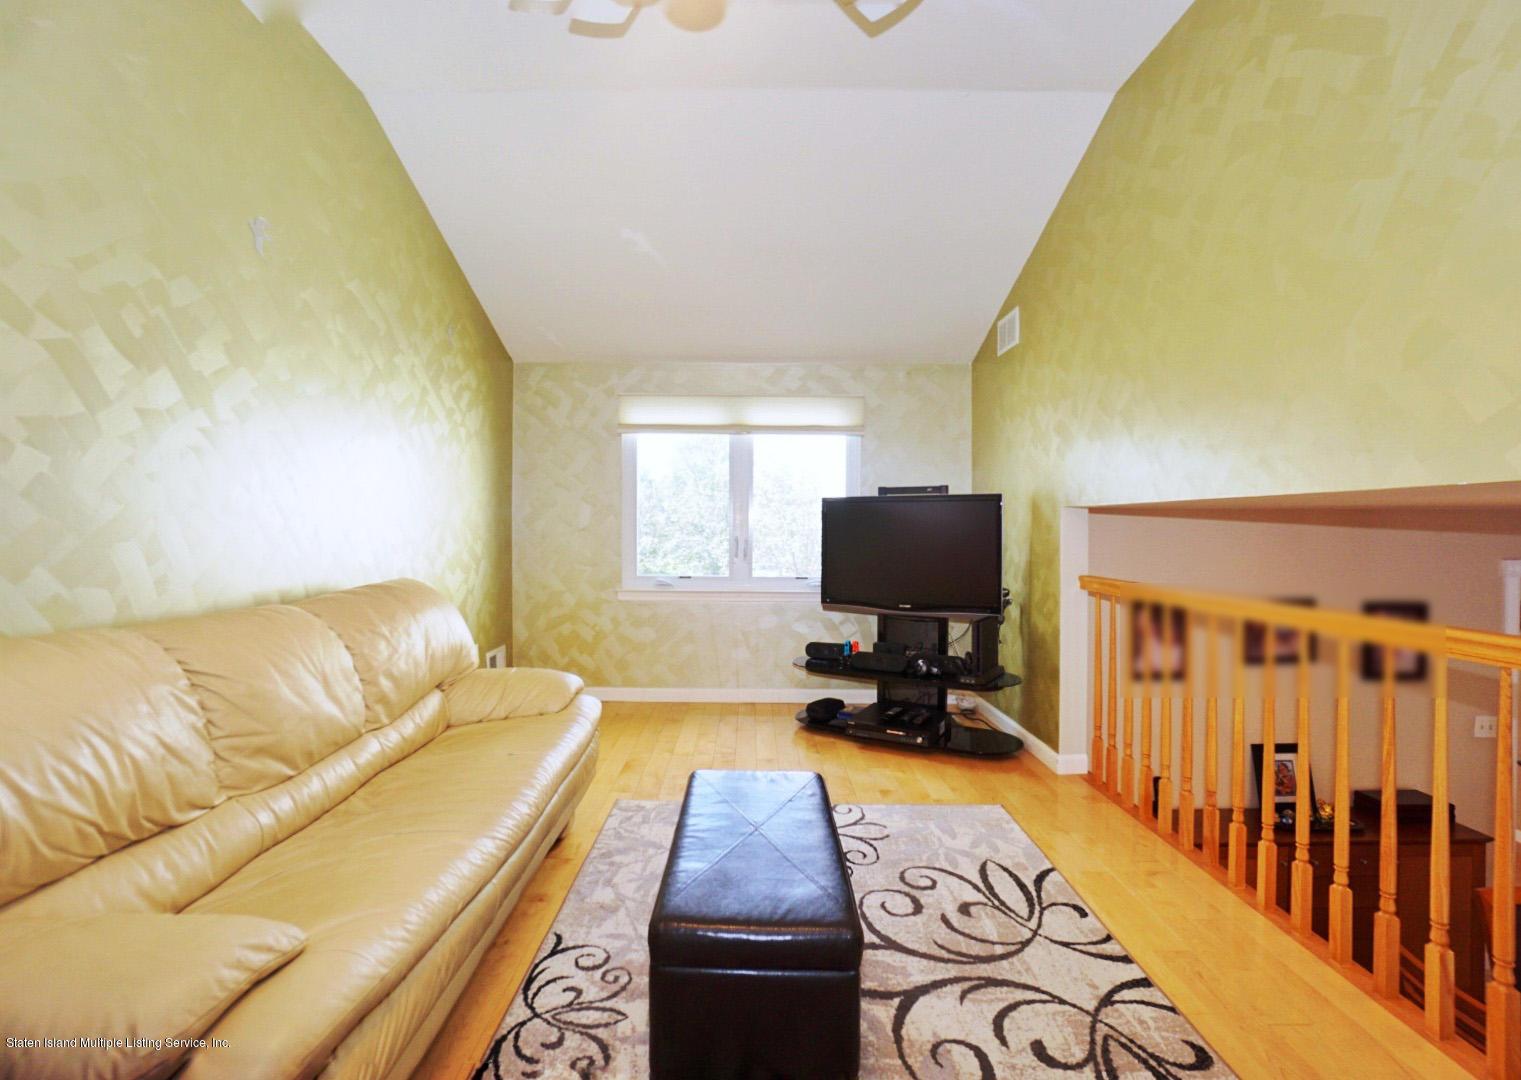 Single Family - Semi-Attached 18 Dunhill Lane  Staten Island, NY 10309, MLS-1139055-16